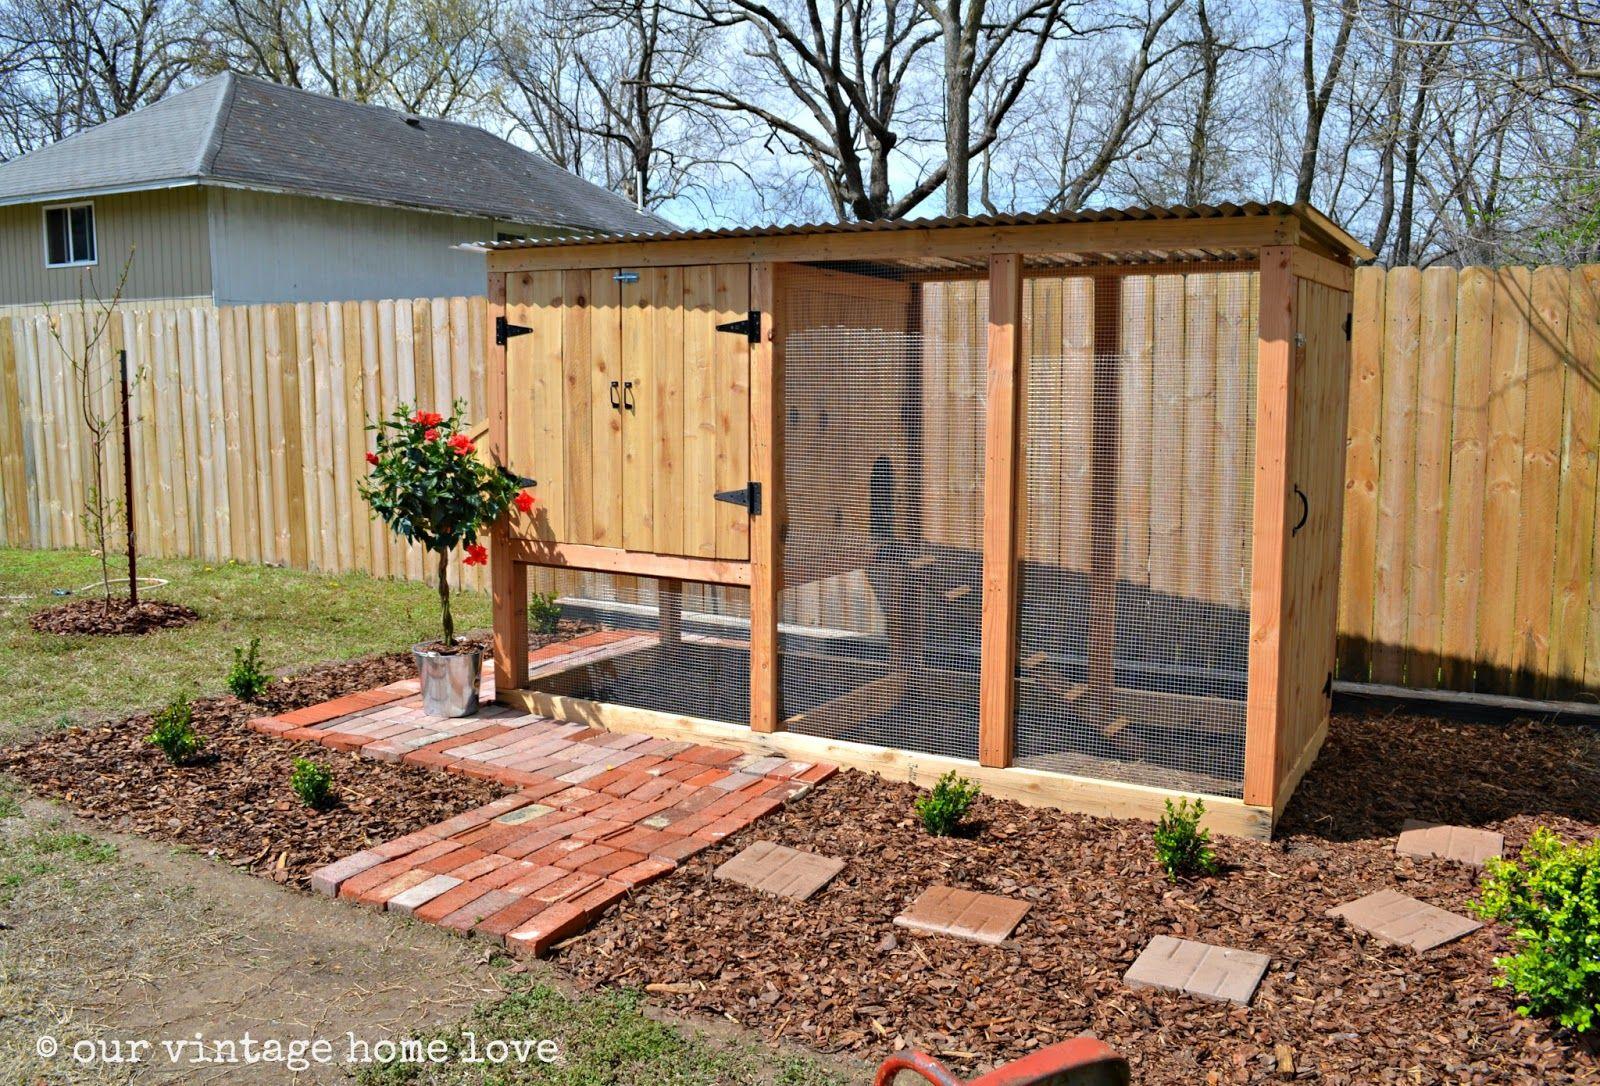 @our vintage home love blog. DIY project April 2013